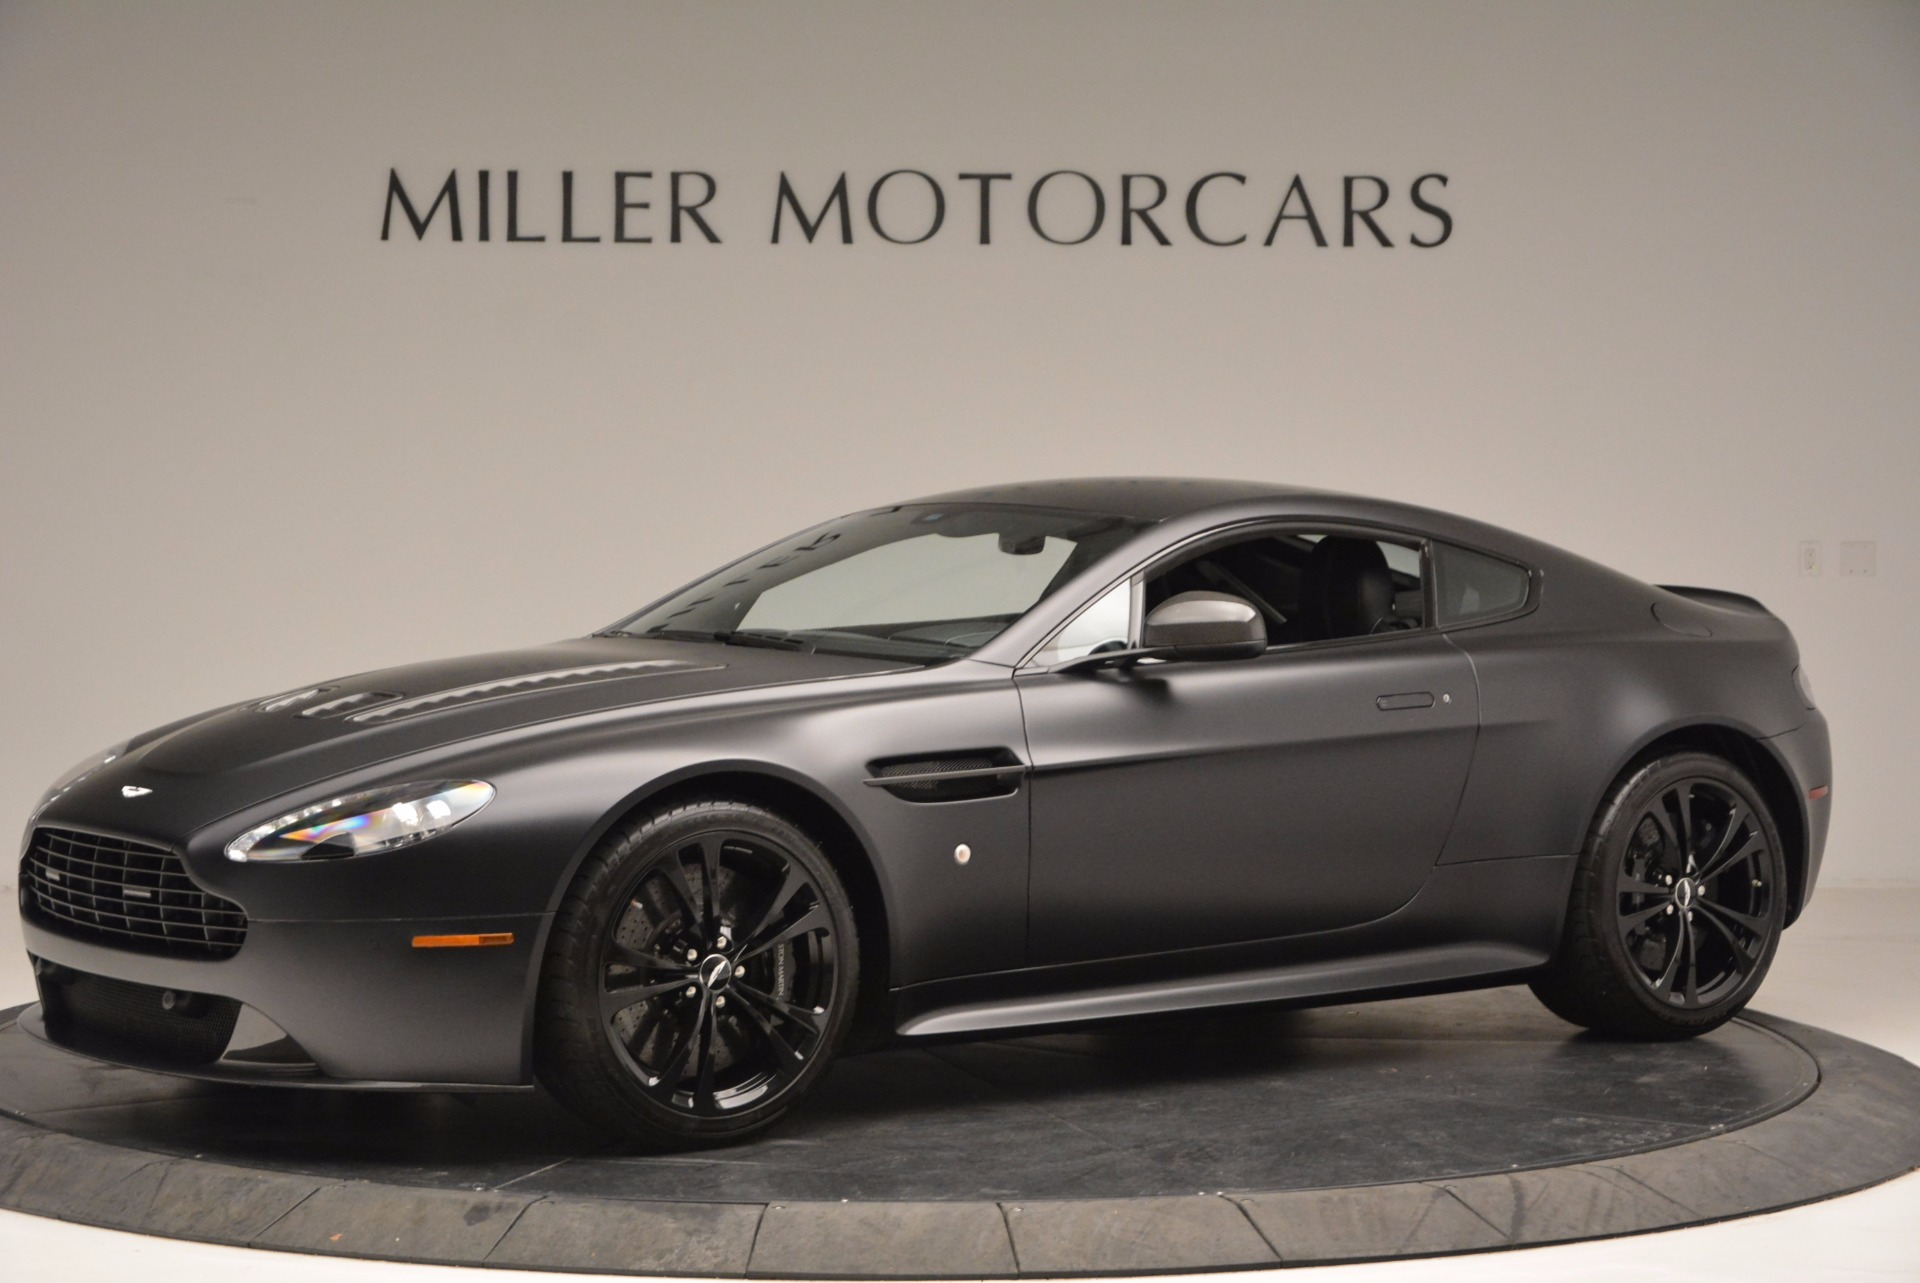 2012 Aston Martin V12 Vantage Carbon Black Stock A1214a For Sale